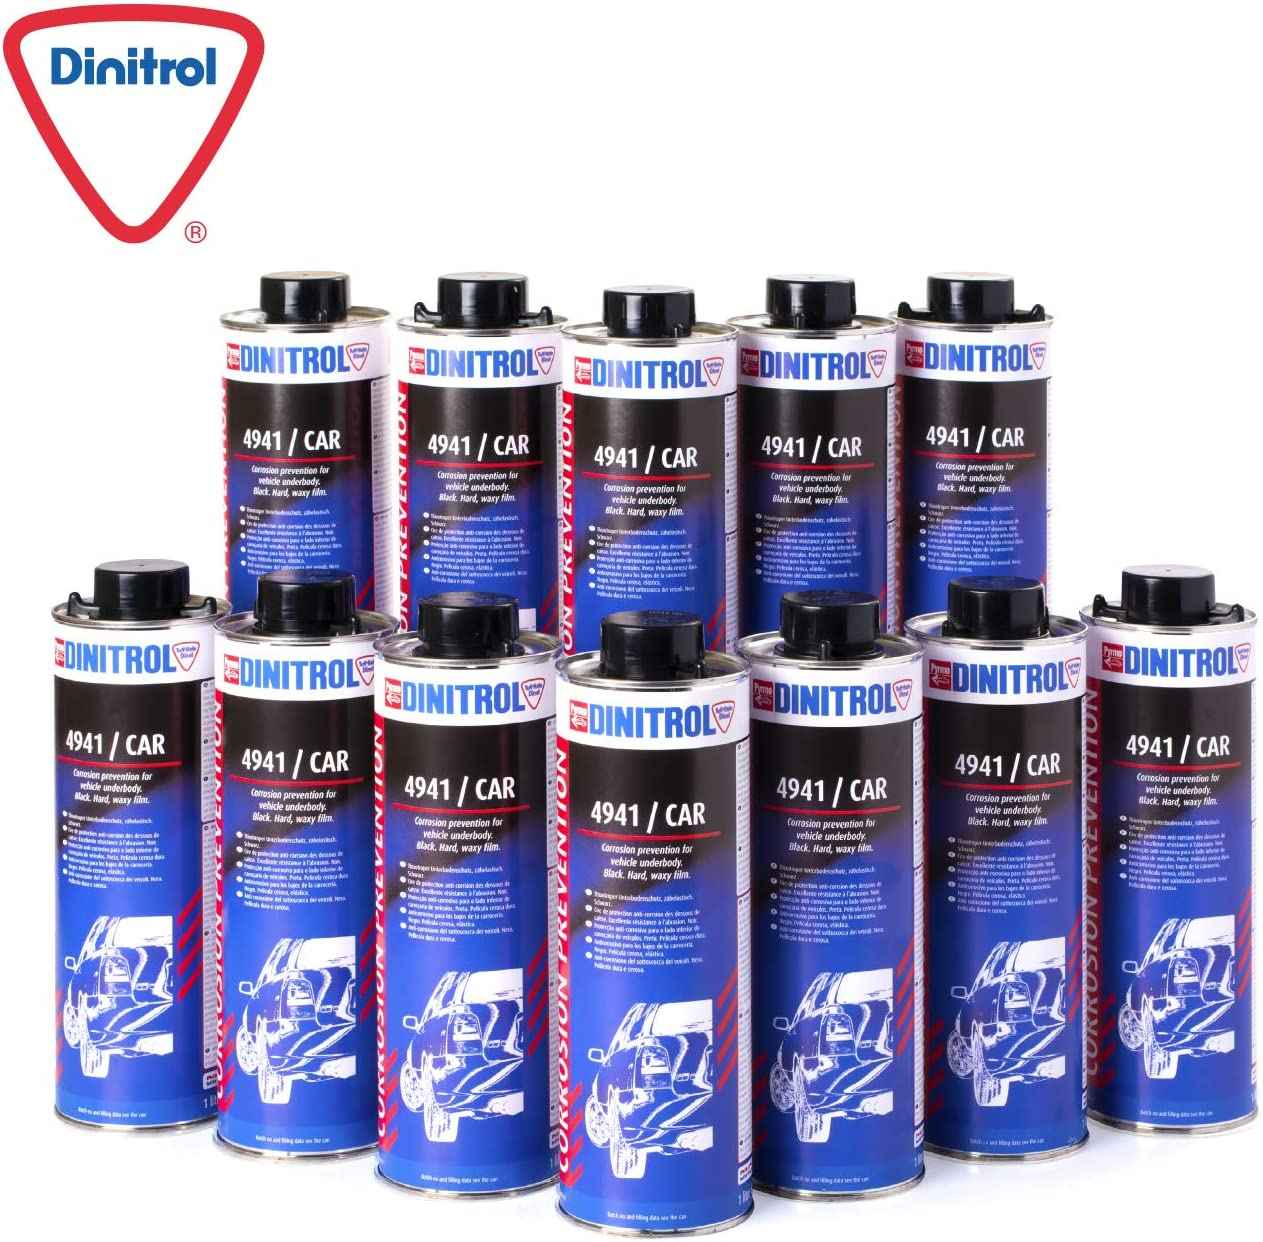 Dinitrol 4941 Schwarze Unterboden Chassis Selbstheilende Wachsschutzbeschichtung 12 X 1 Liter Kanister Schutzart Schraubverschluss Auto